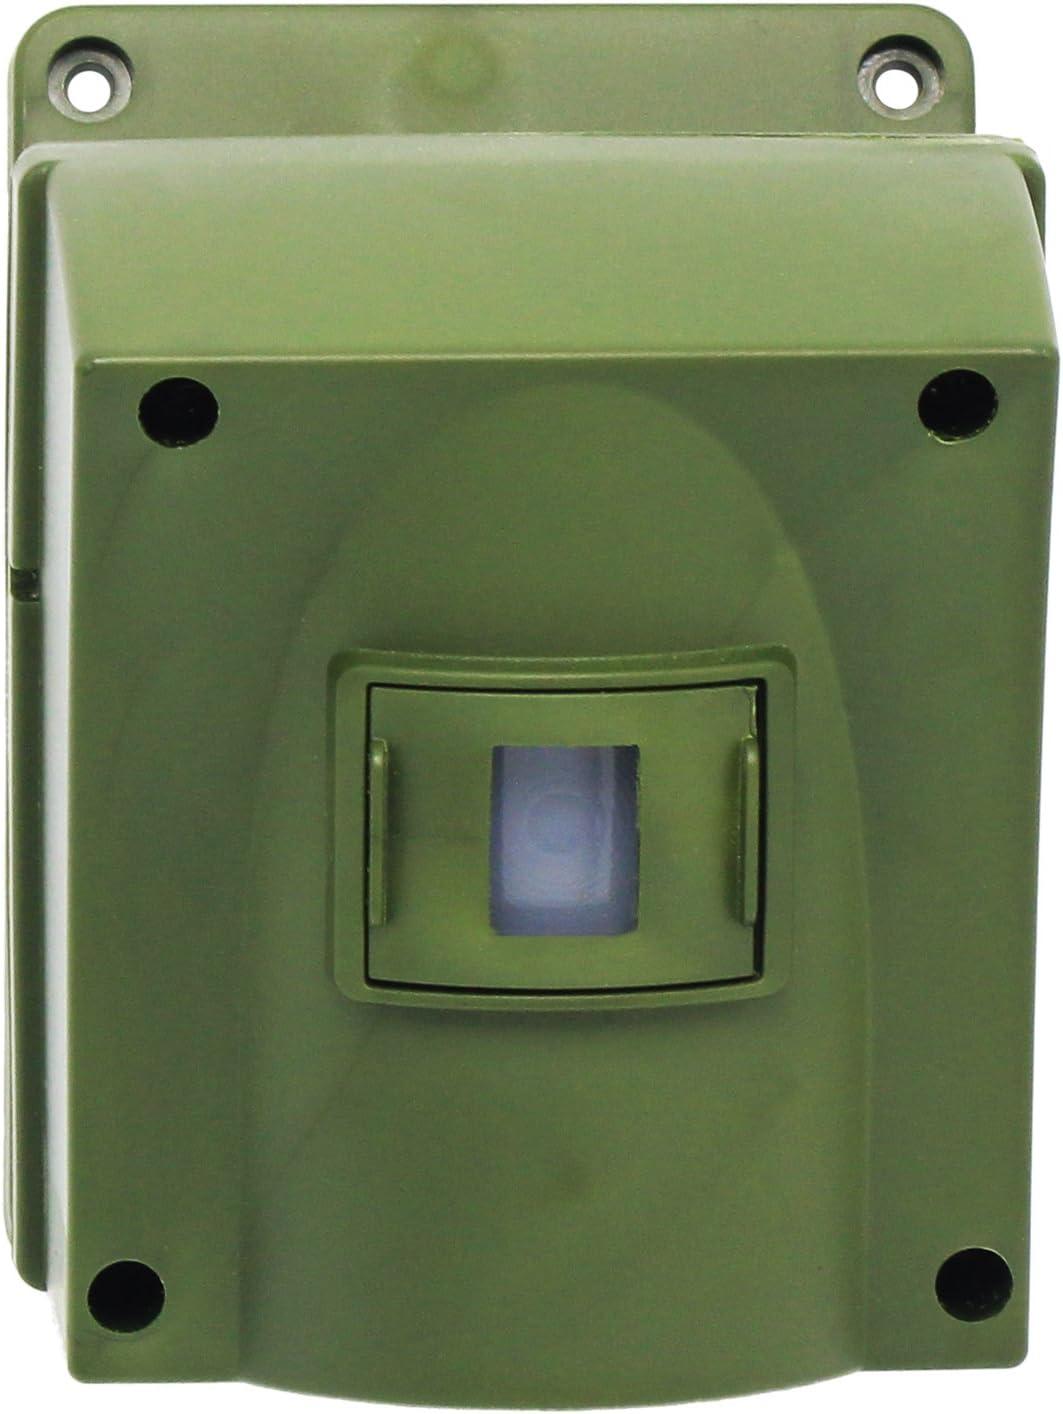 Extra Sensor for 1/4 Mile Long Range Driveway Alarm by Guardline